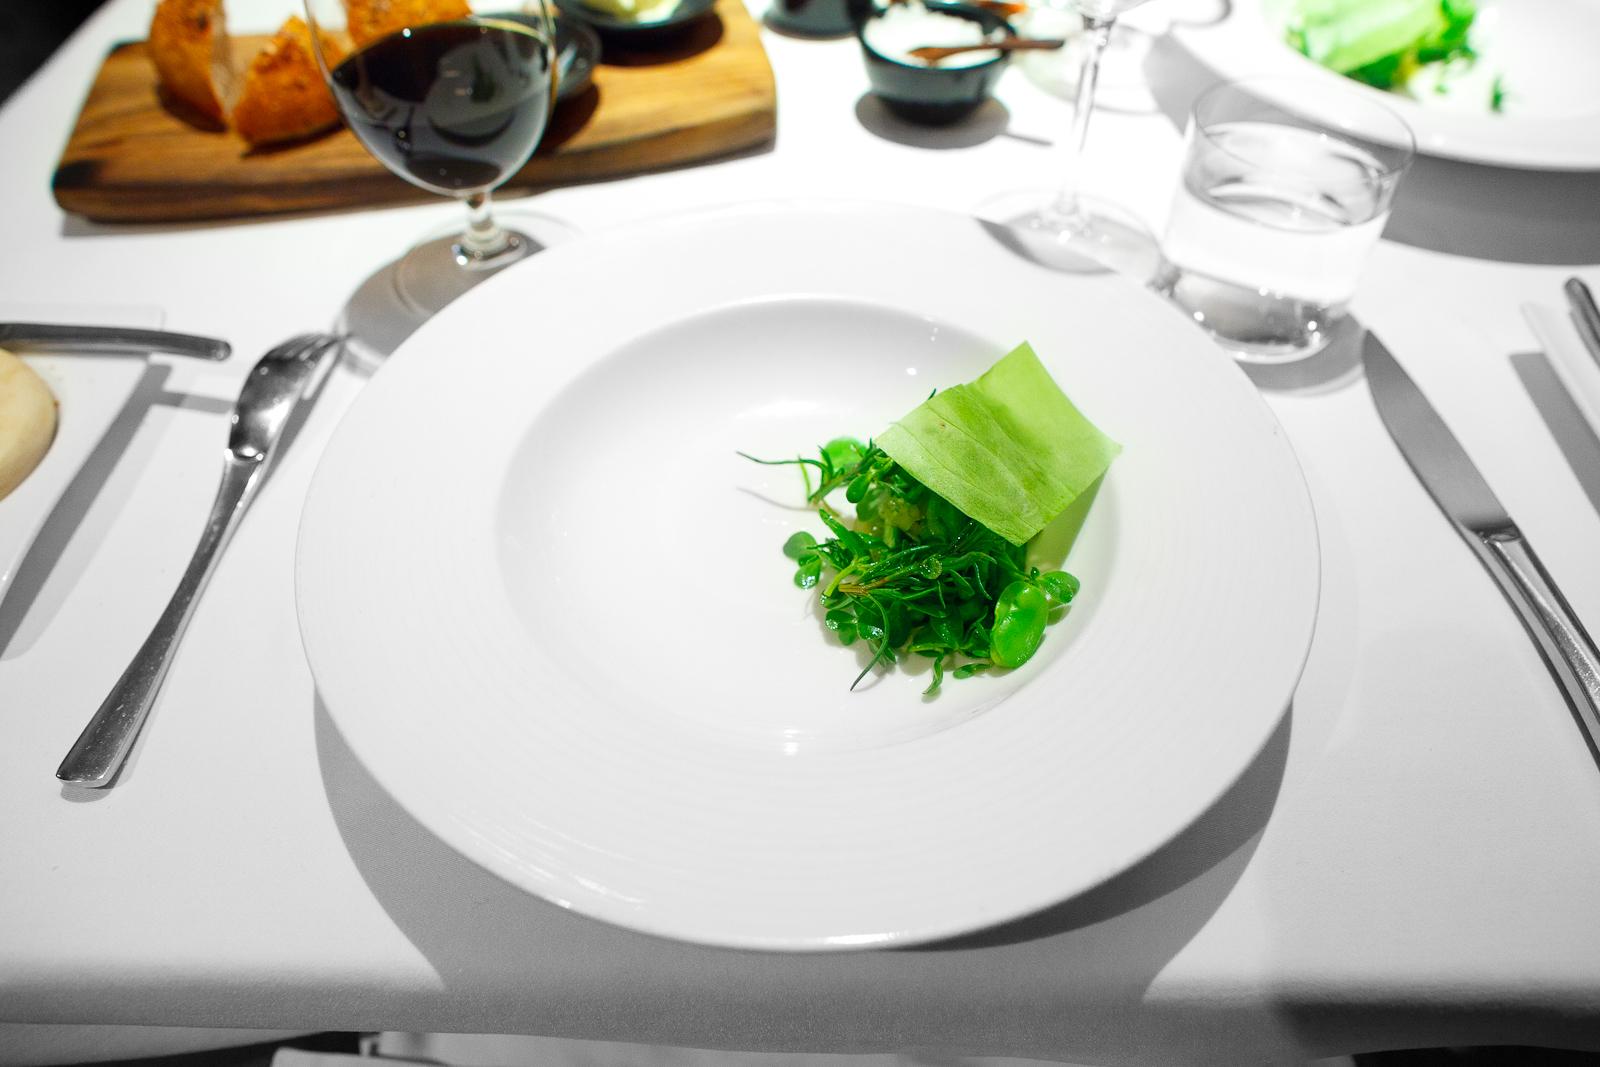 1st Course: Nopal salad, fava beans, sweet pea shoots, dehydrated nopal leaf